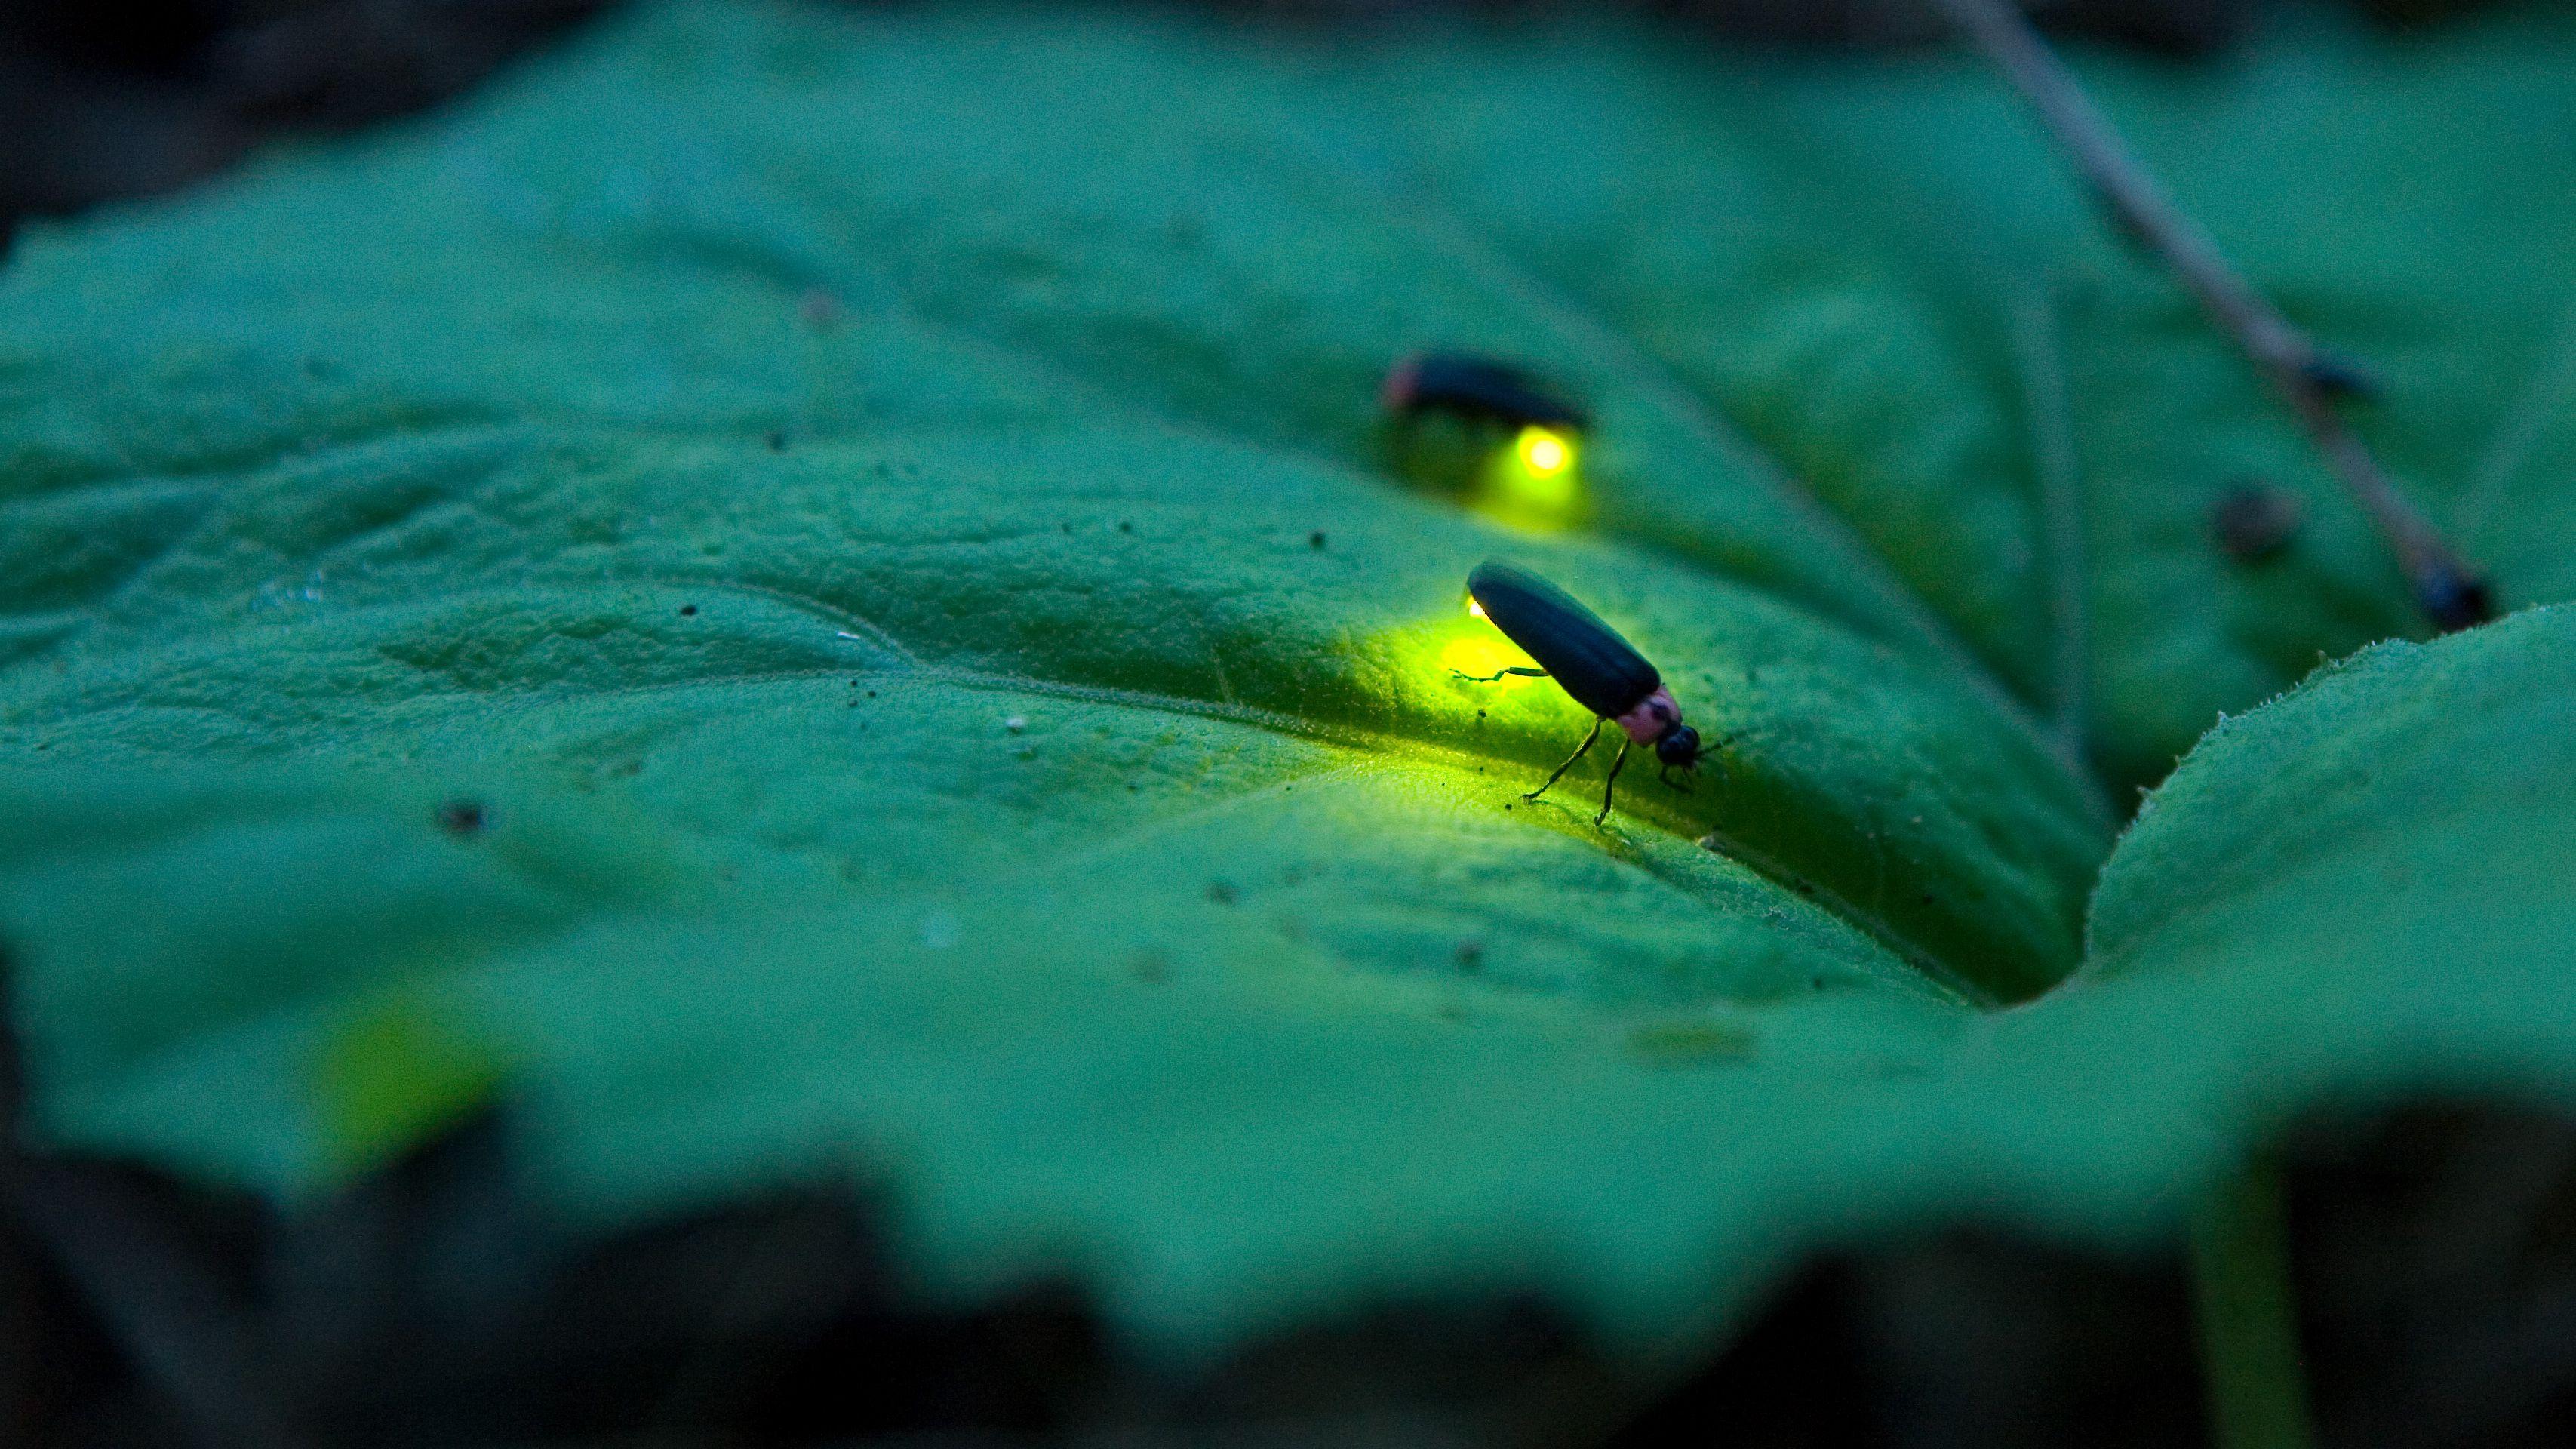 Life Cycle of Fireflies and Lightning Bugs